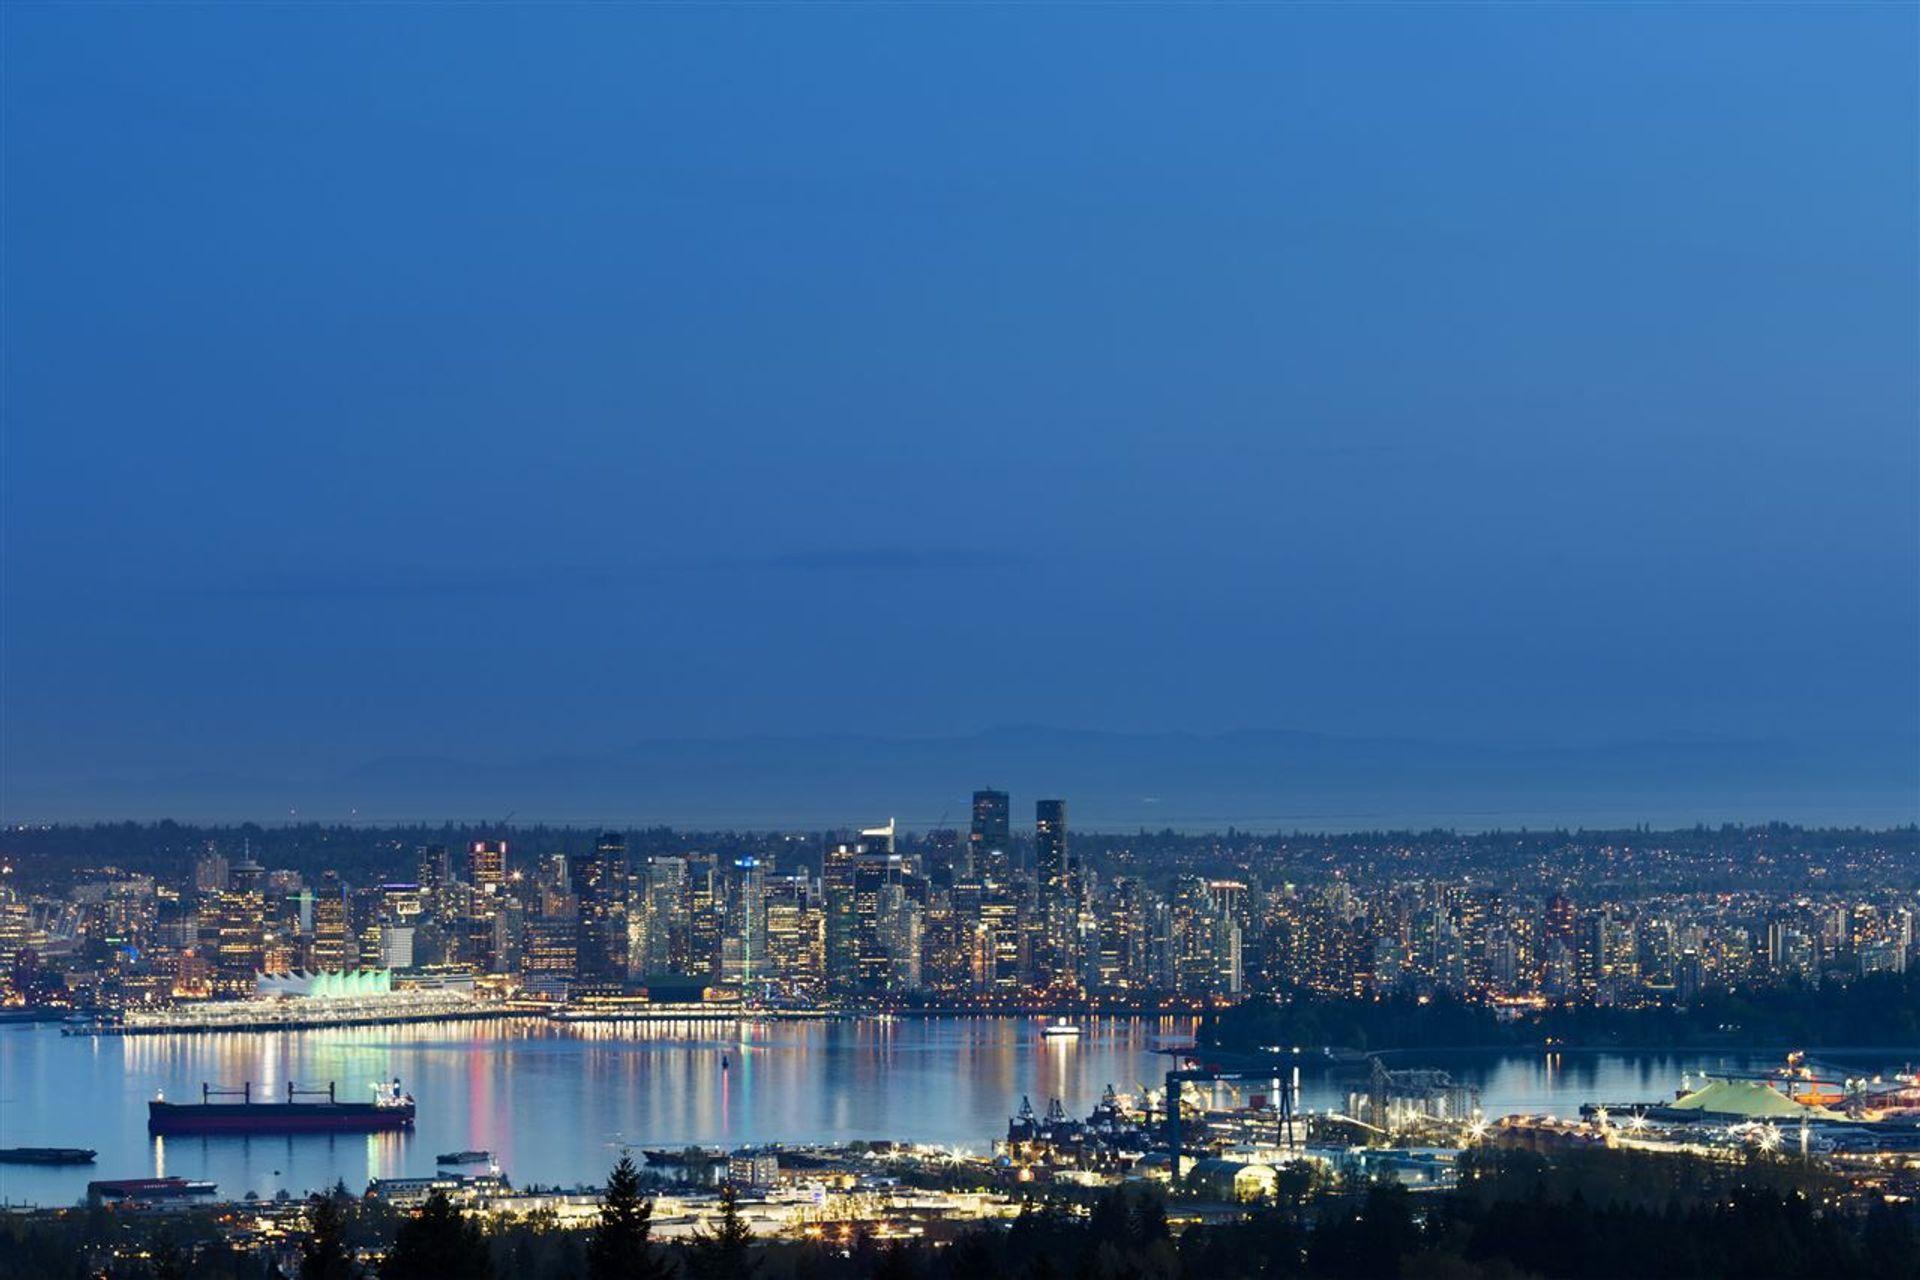 212-newdale-court-upper-delbrook-north-vancouver-03 at 212 Newdale Court, Upper Delbrook, North Vancouver